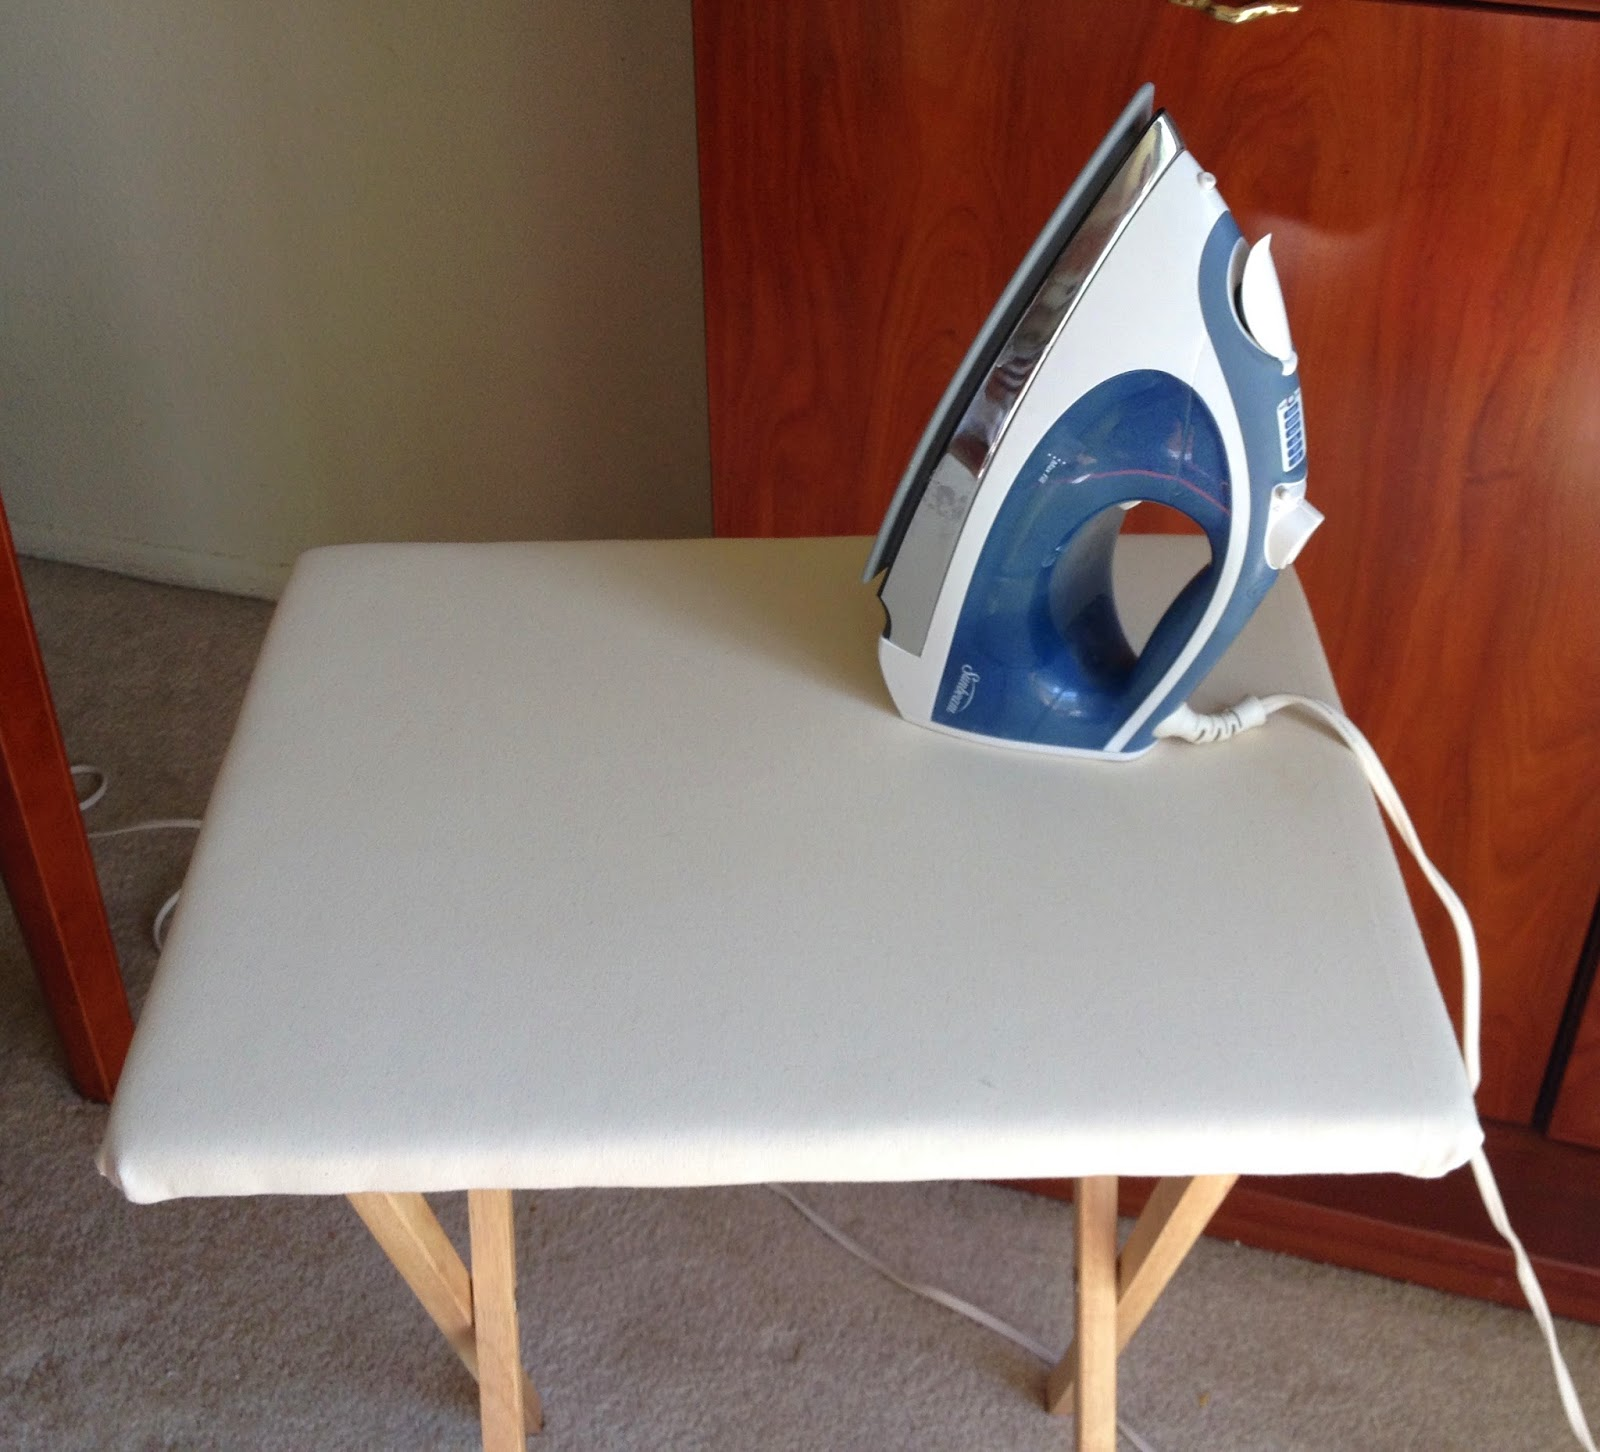 Cmo hacer una mesa plegable de planchar Tutorial MagicXstitch